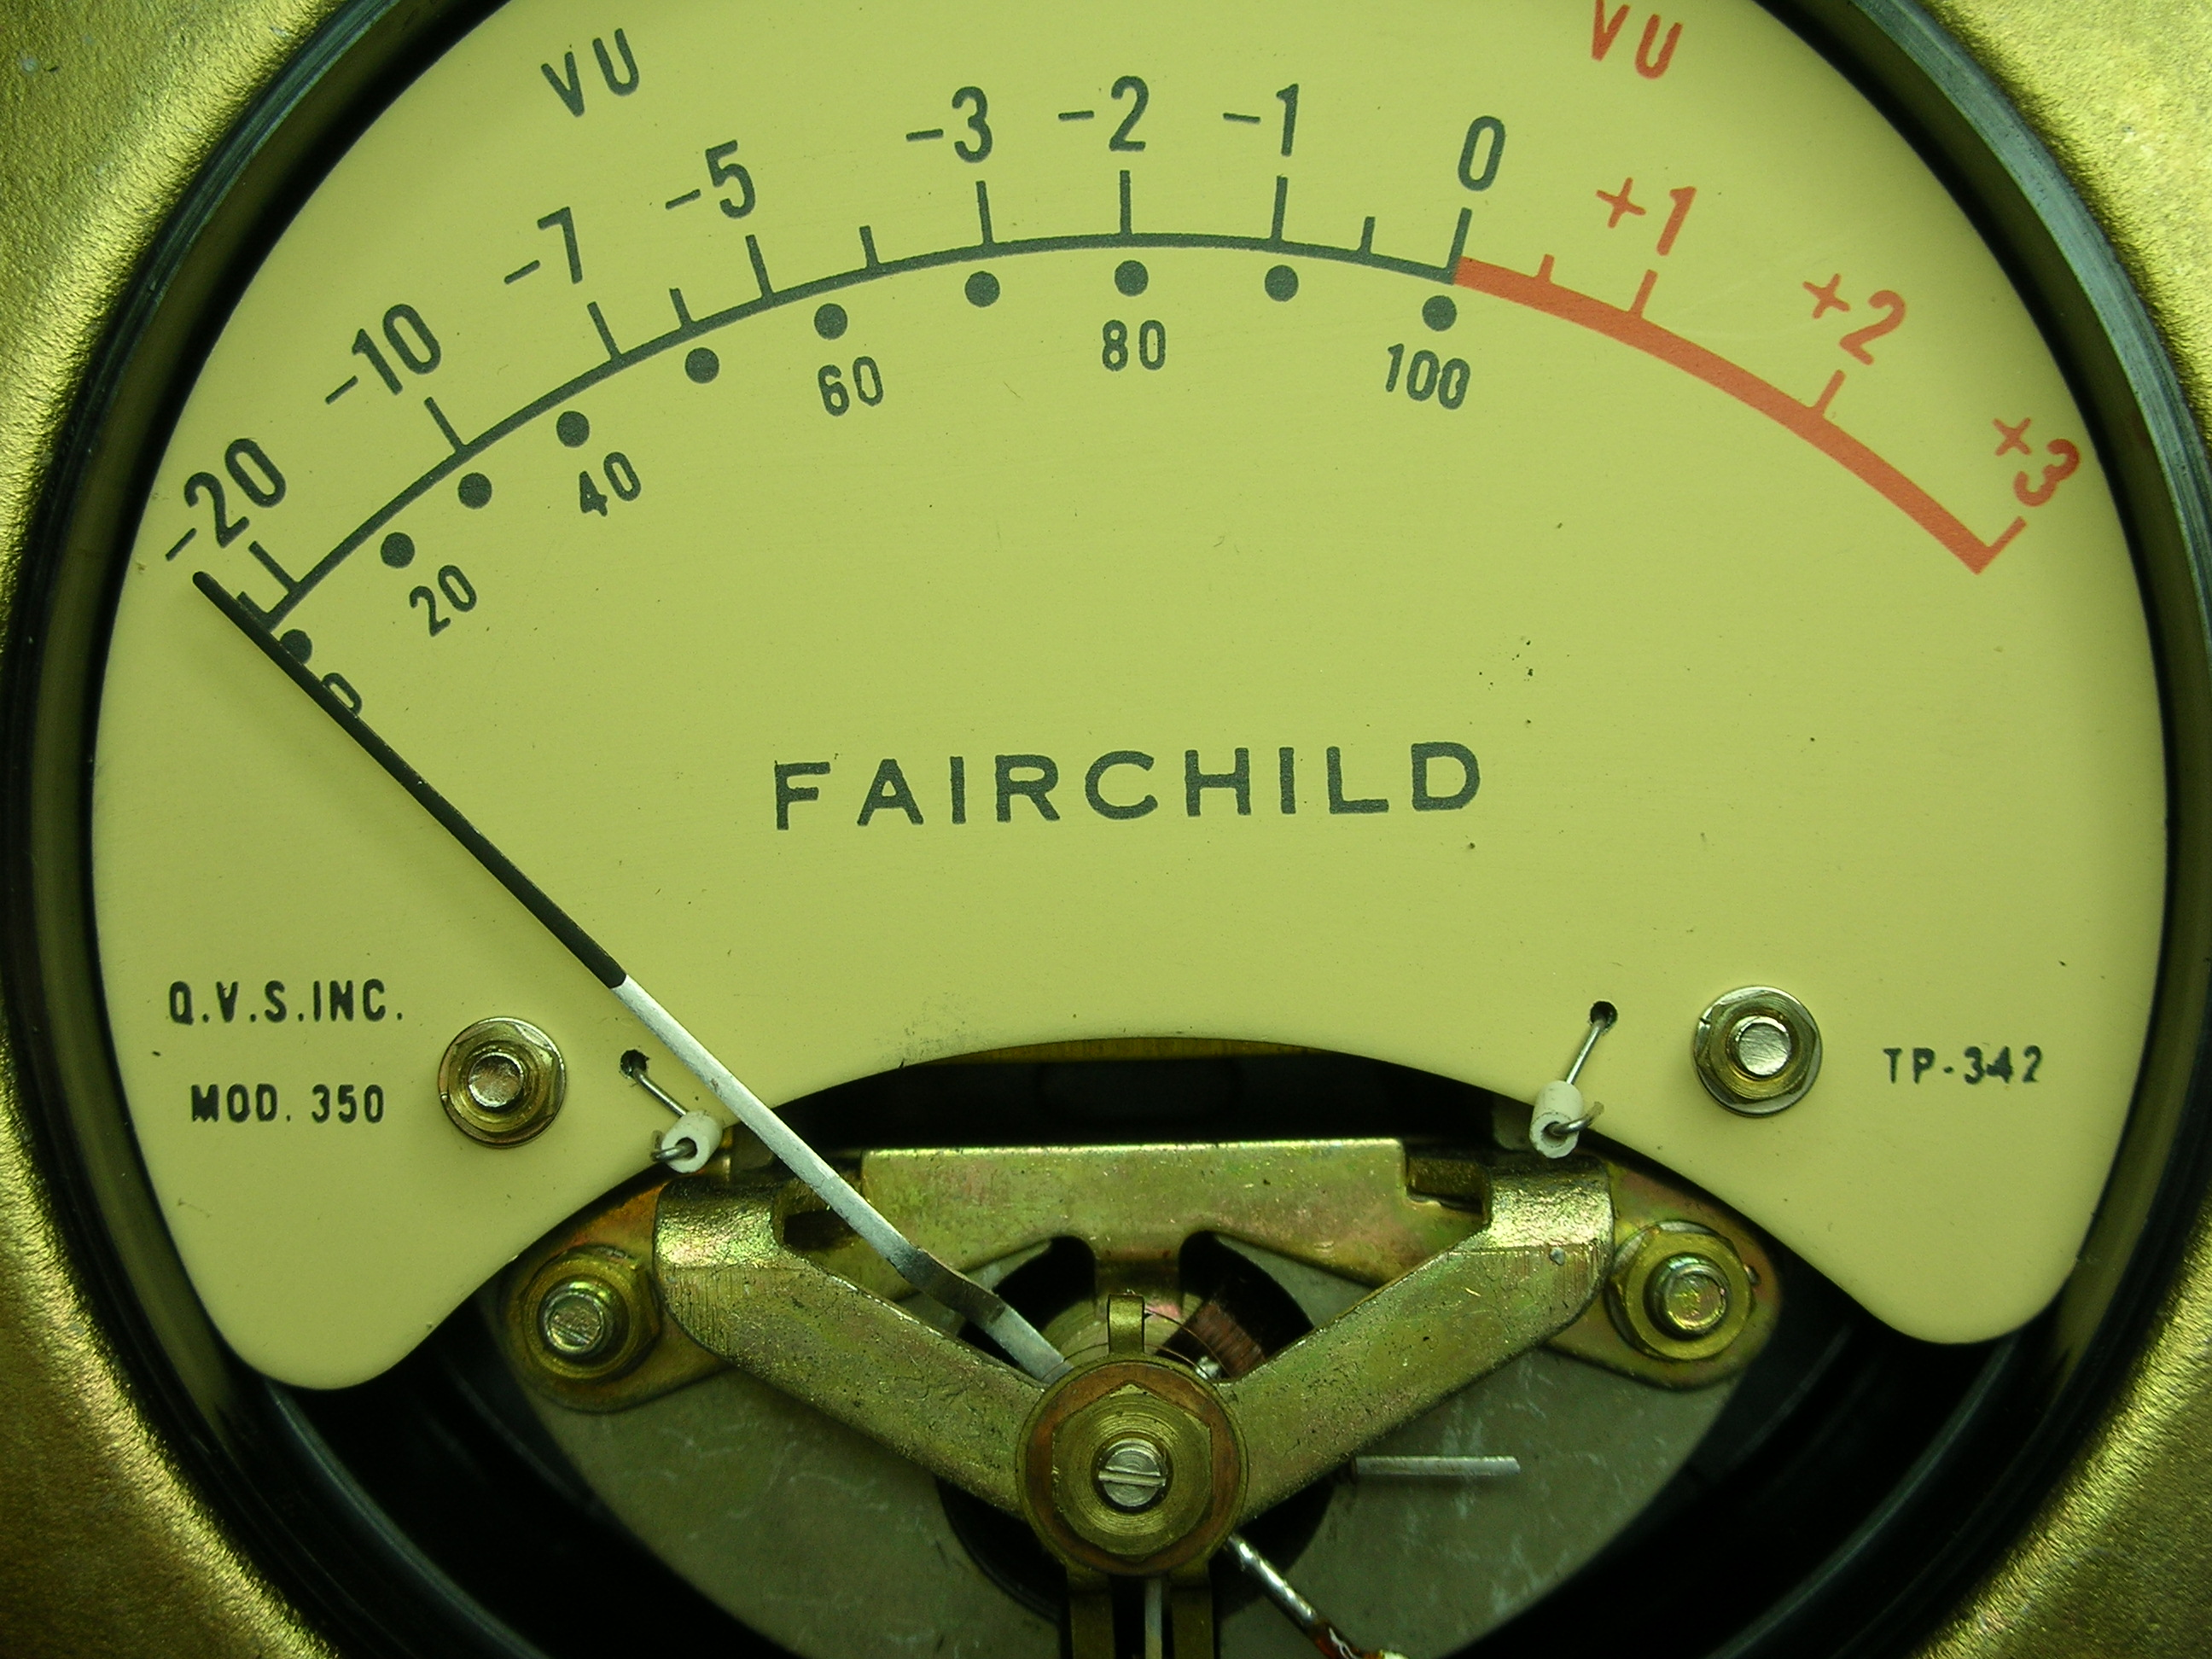 Original Fairchild 670 meter